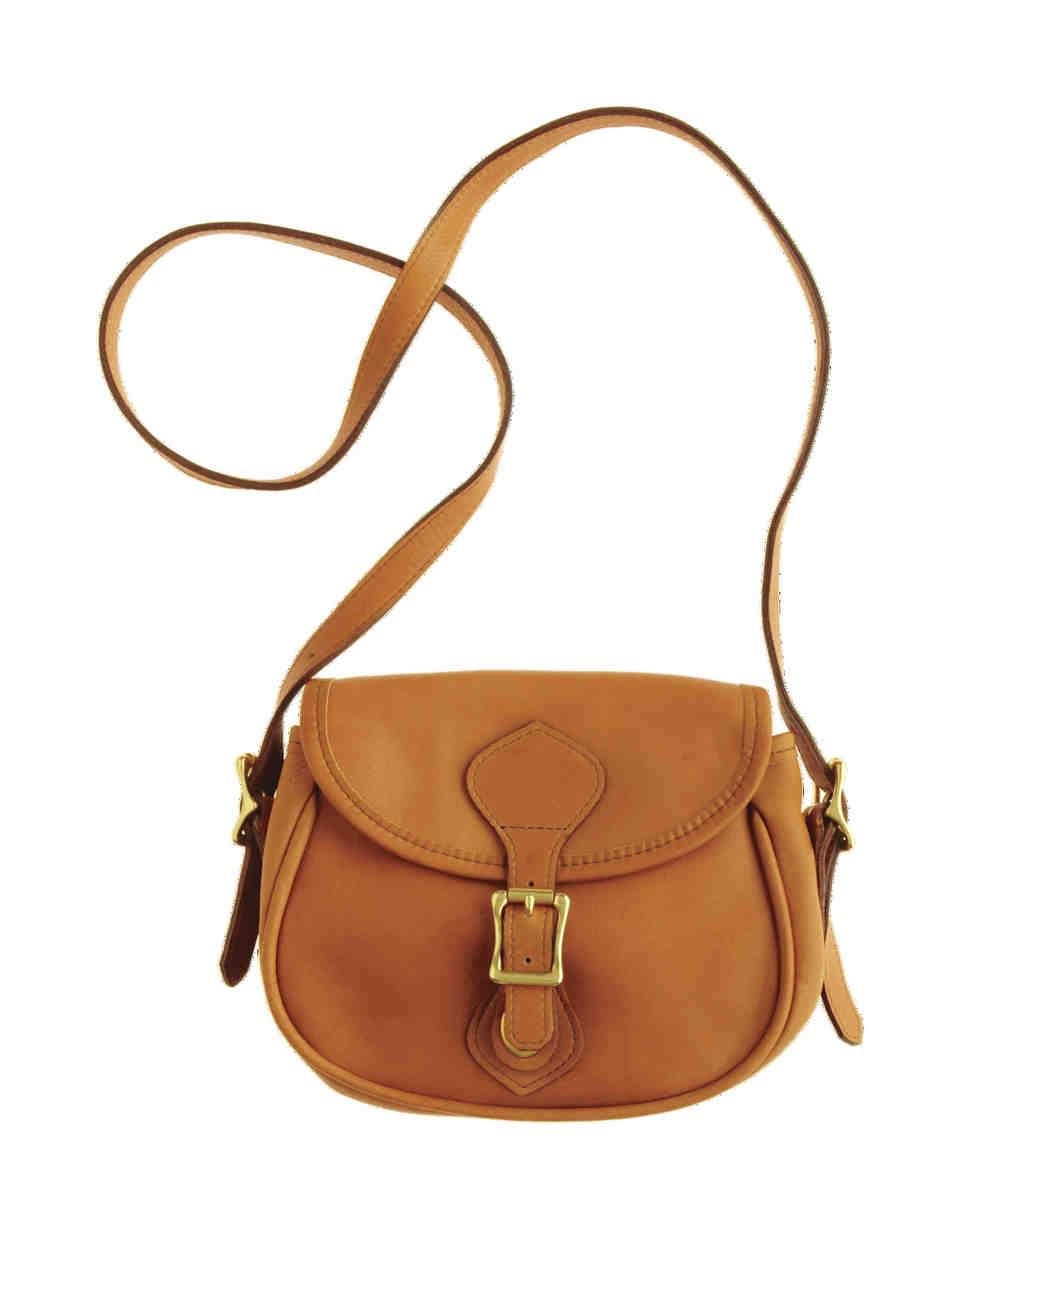 travel-accessories-brown-purse-mwd107604.jpg